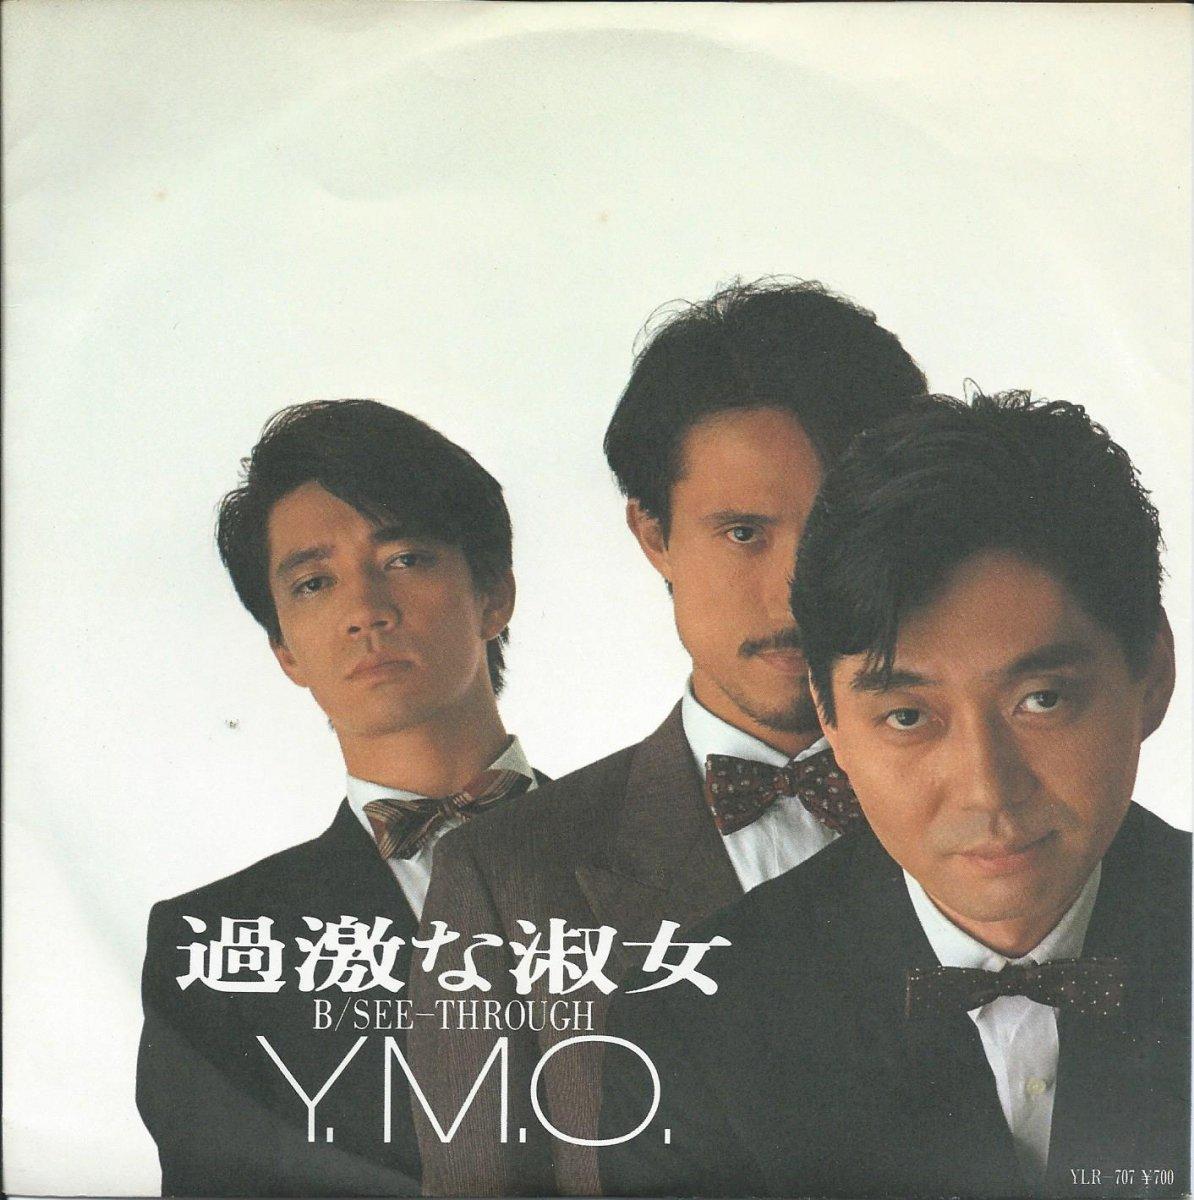 Y.M.O. (YELLOW MAGIC ORCHESTRA) / 過激な淑女 / SEE-THROUGH (7